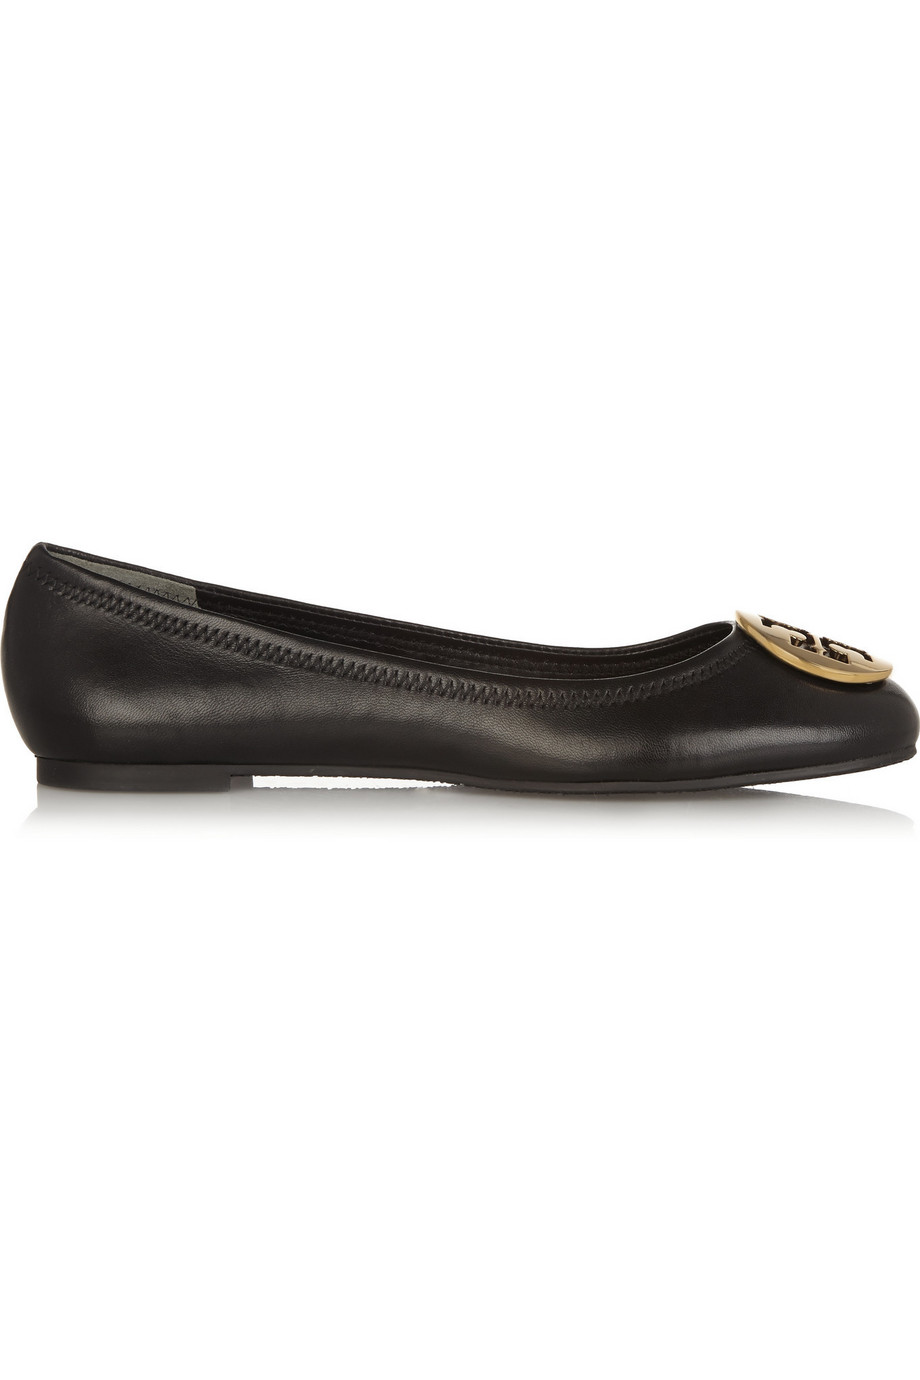 Tory Burch Reva Leather Ballet Flats, Black, Women's, Size: 10.5